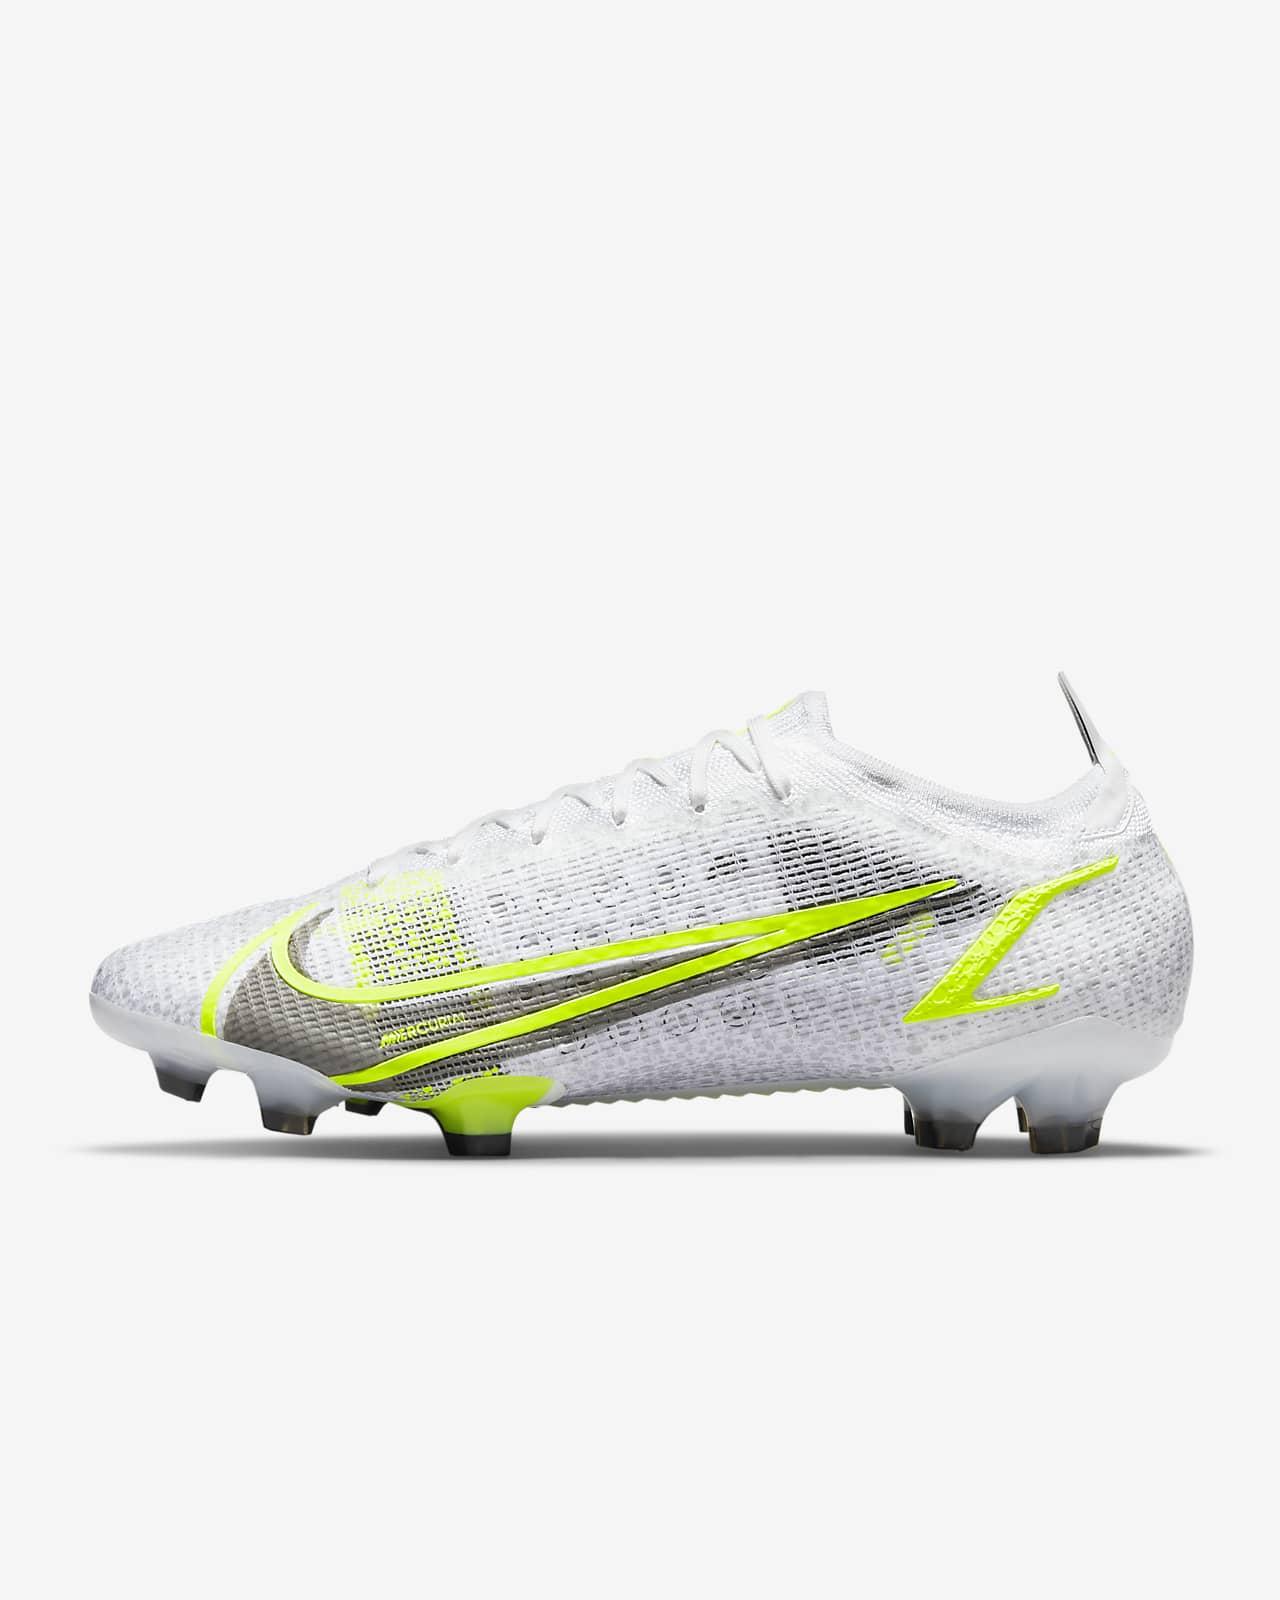 Nike Mercurial Vapor 14 Elite FG Firm-Ground Soccer Cleats